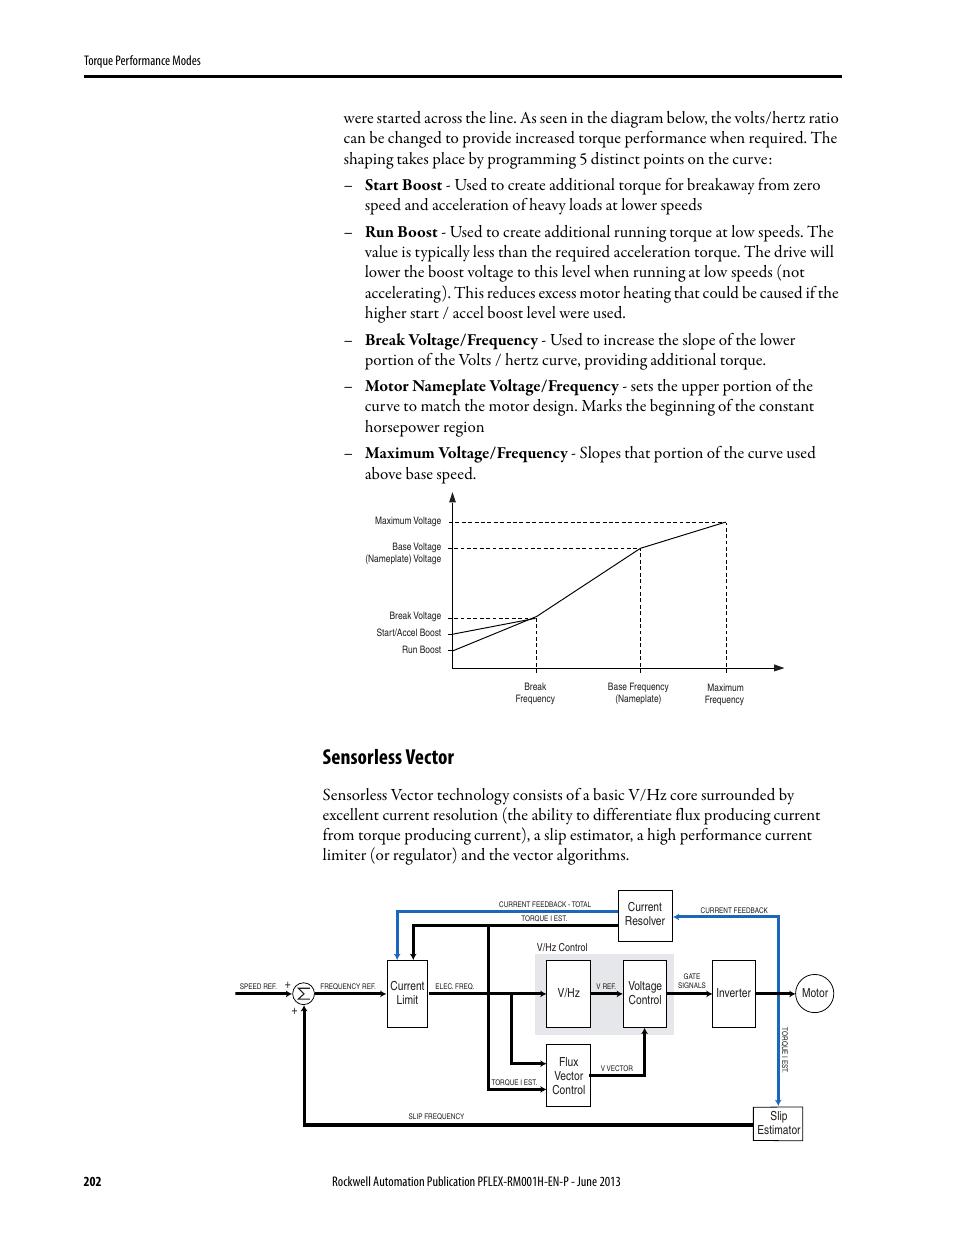 Powerflex 400 Wiring Diagram Trusted Diagrams 753 A Double Duplex Outlet Allen Bradley